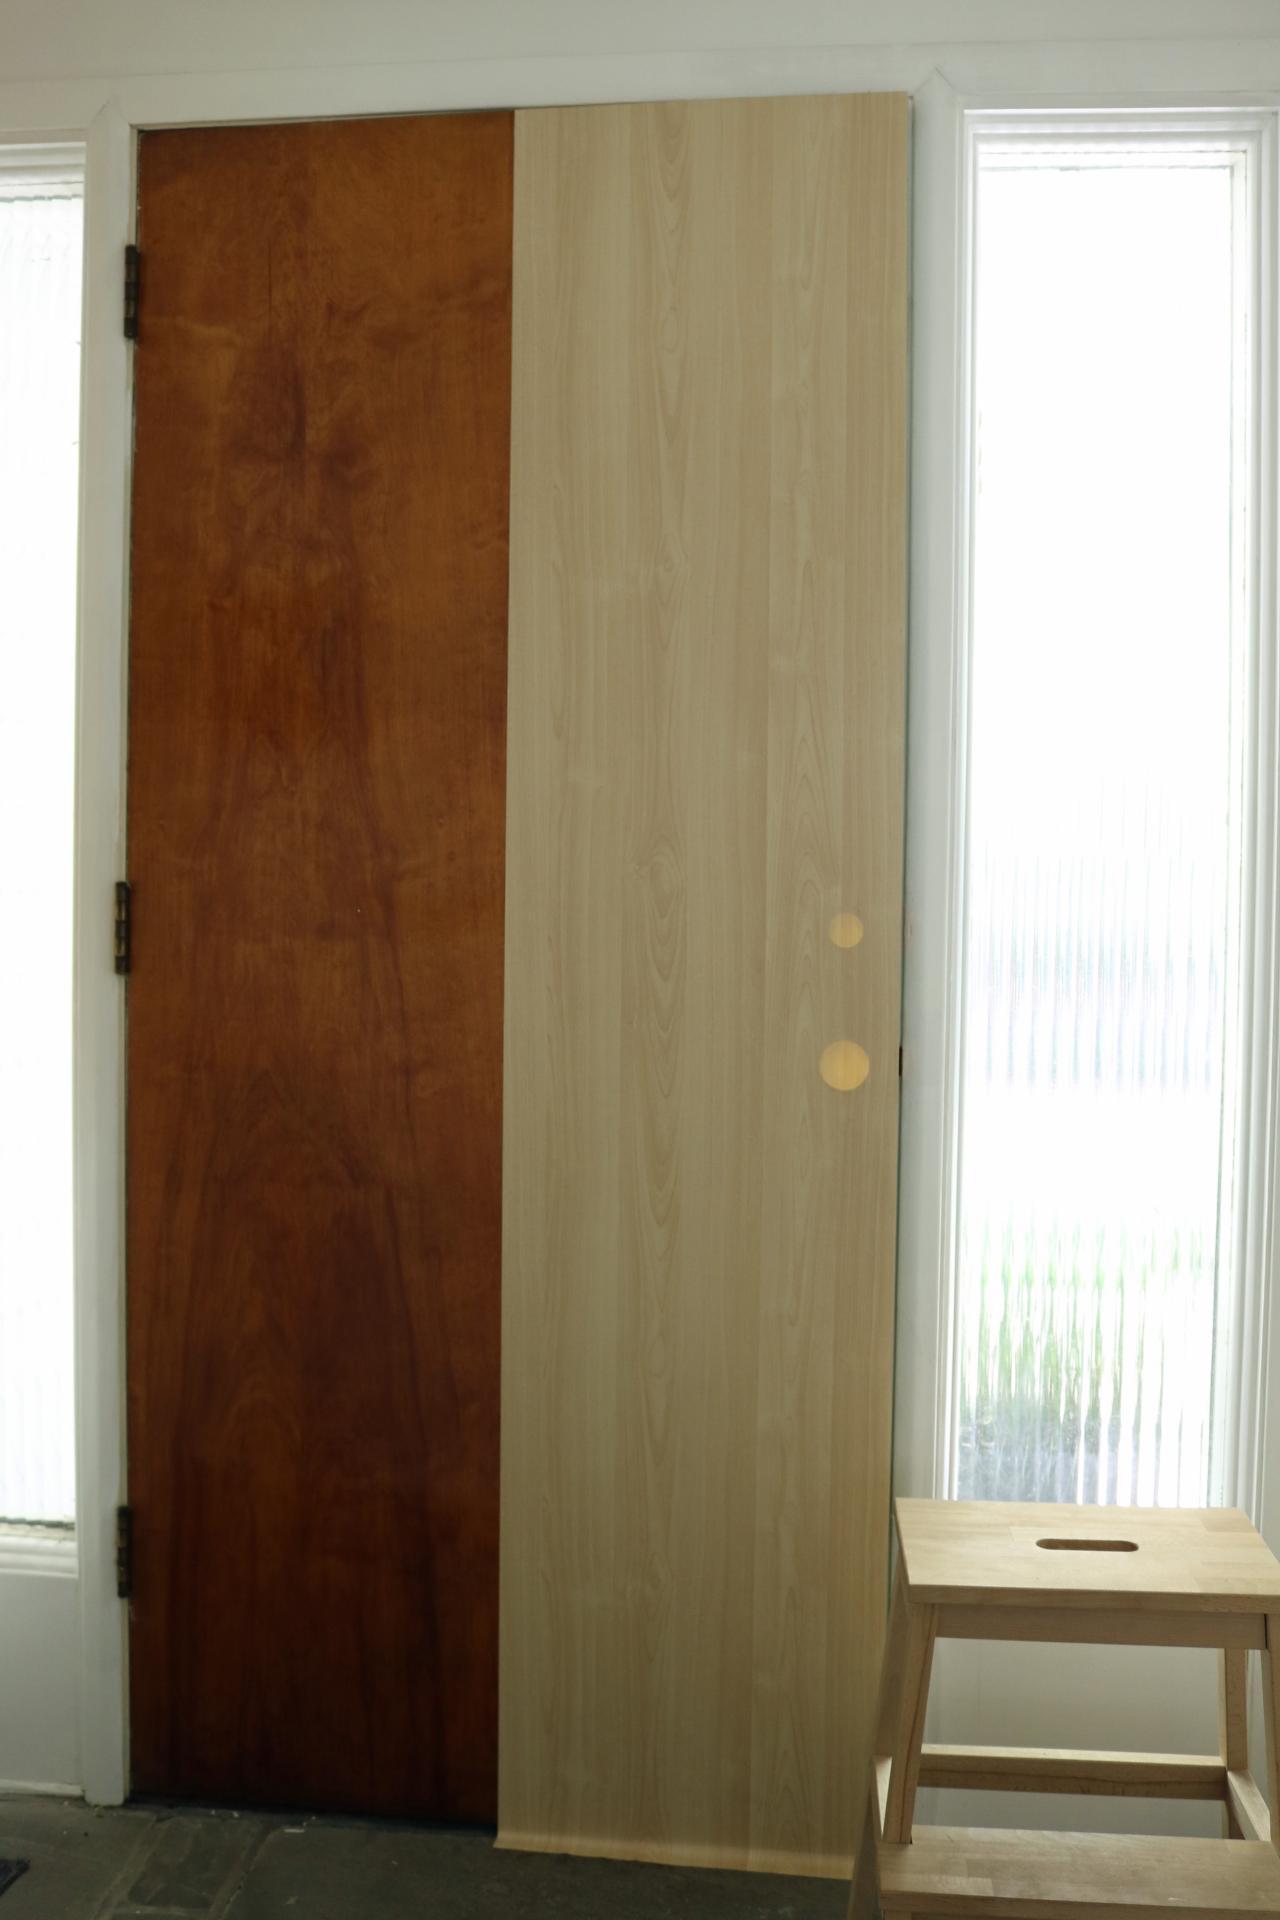 how to put blinds on hollow door